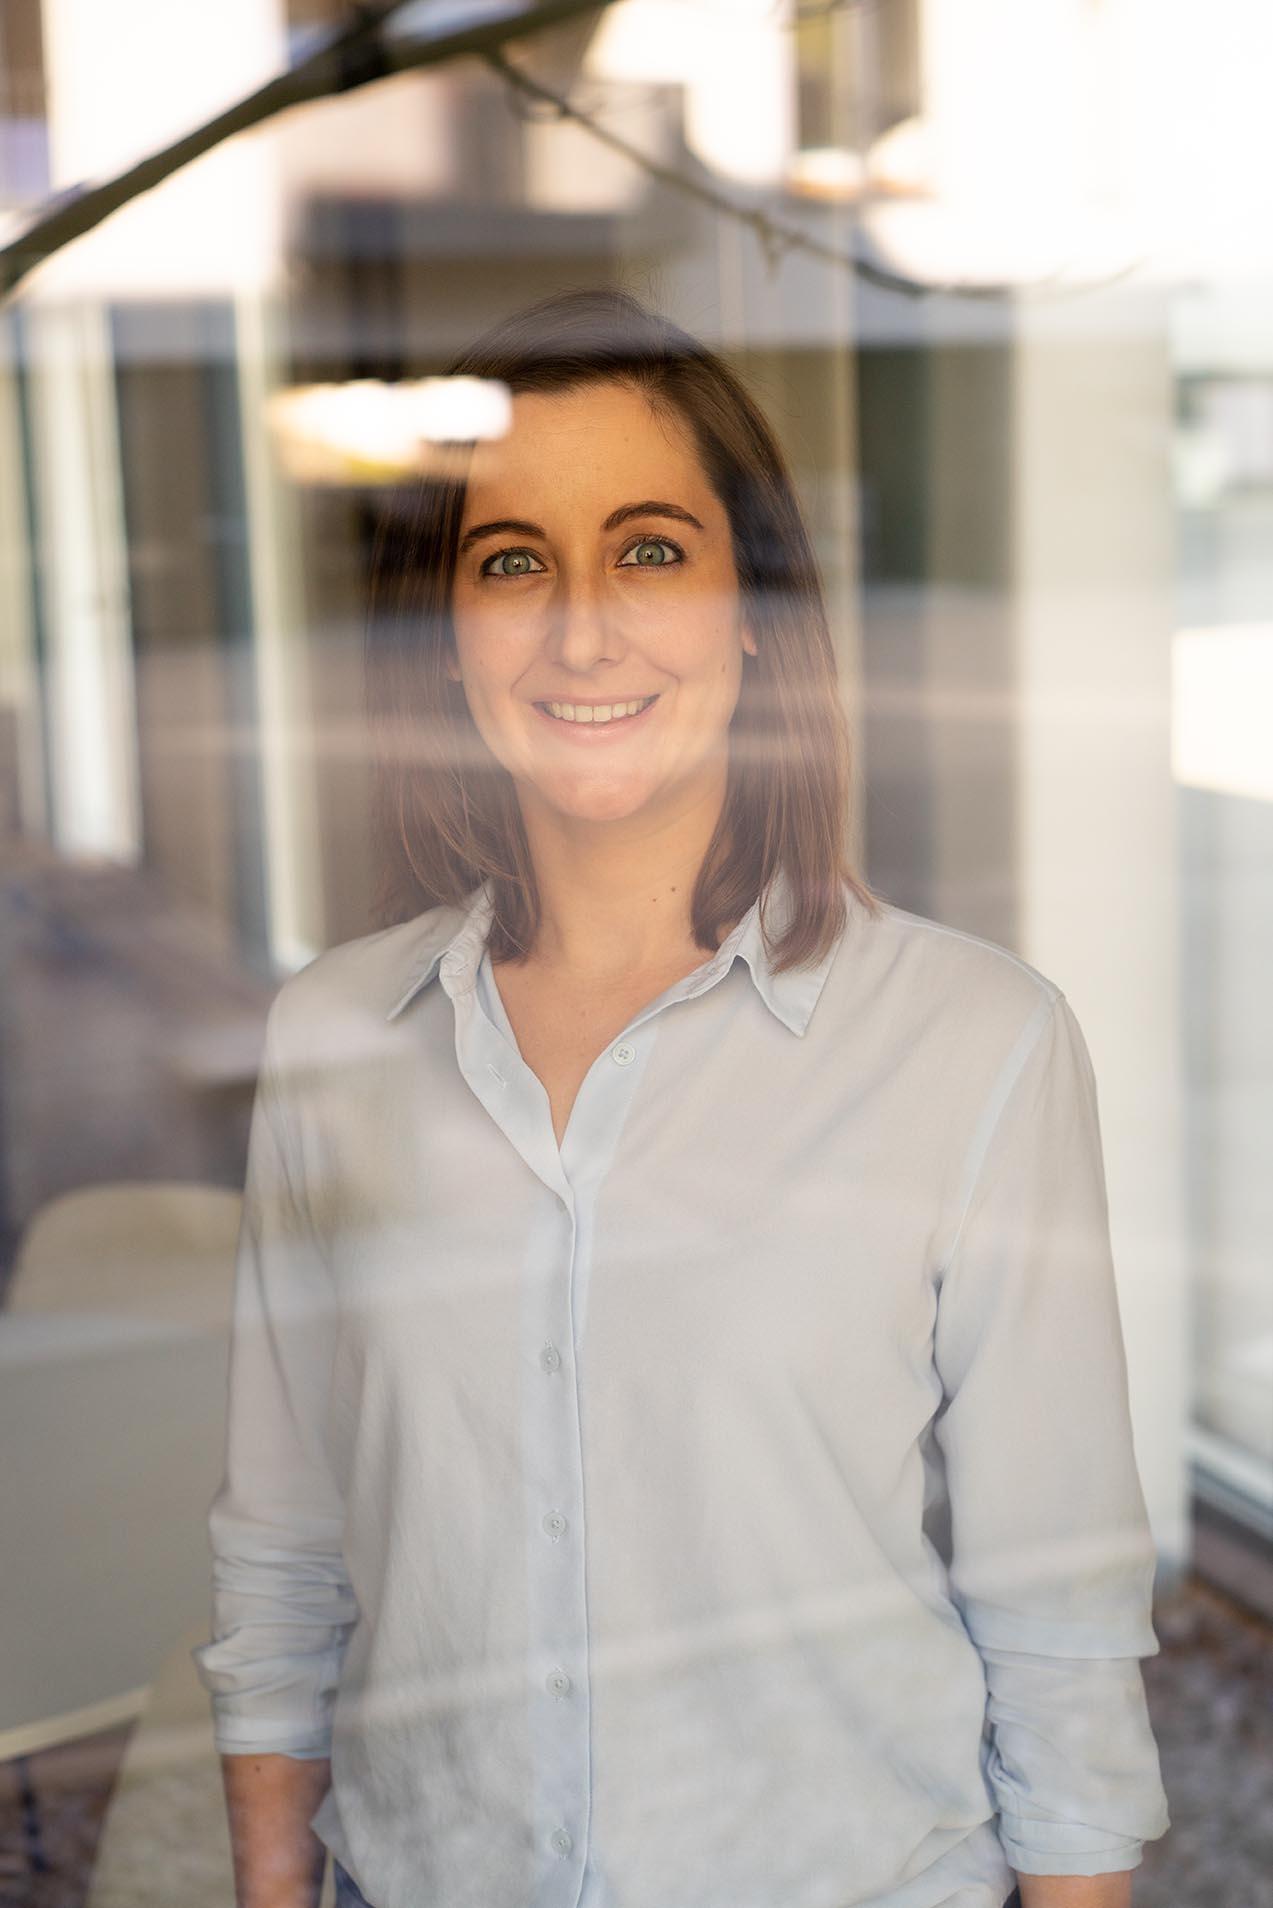 Cécile Haldi, Psychotherapeutin, Lerncoach